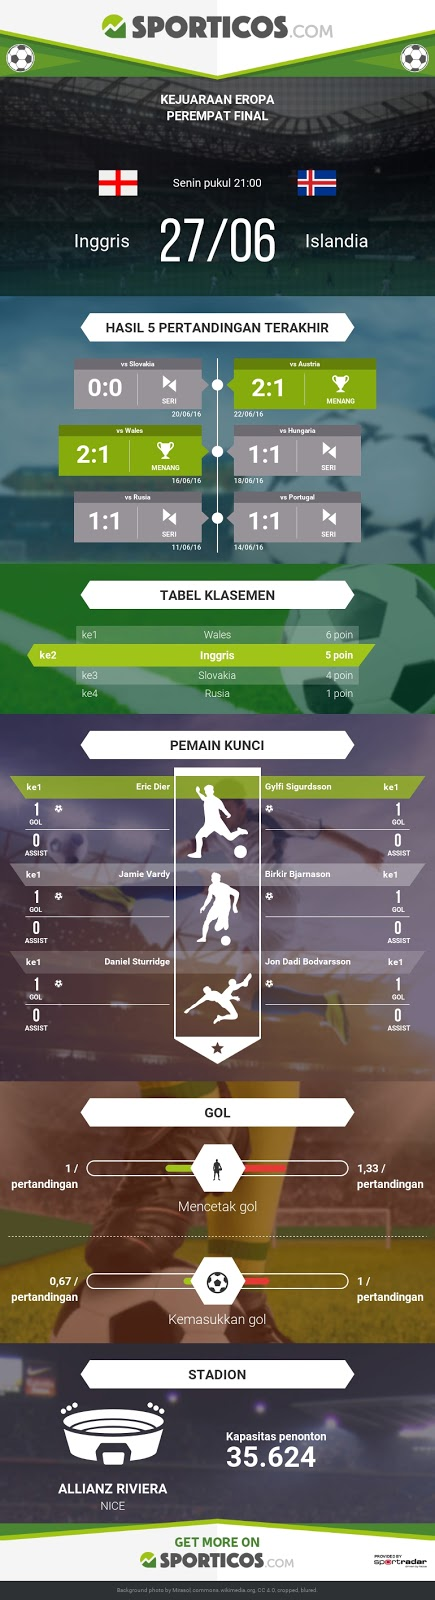 https://sporticos.com/id/2016-06-28/207573-pertandingan-inggris-vs-islandia